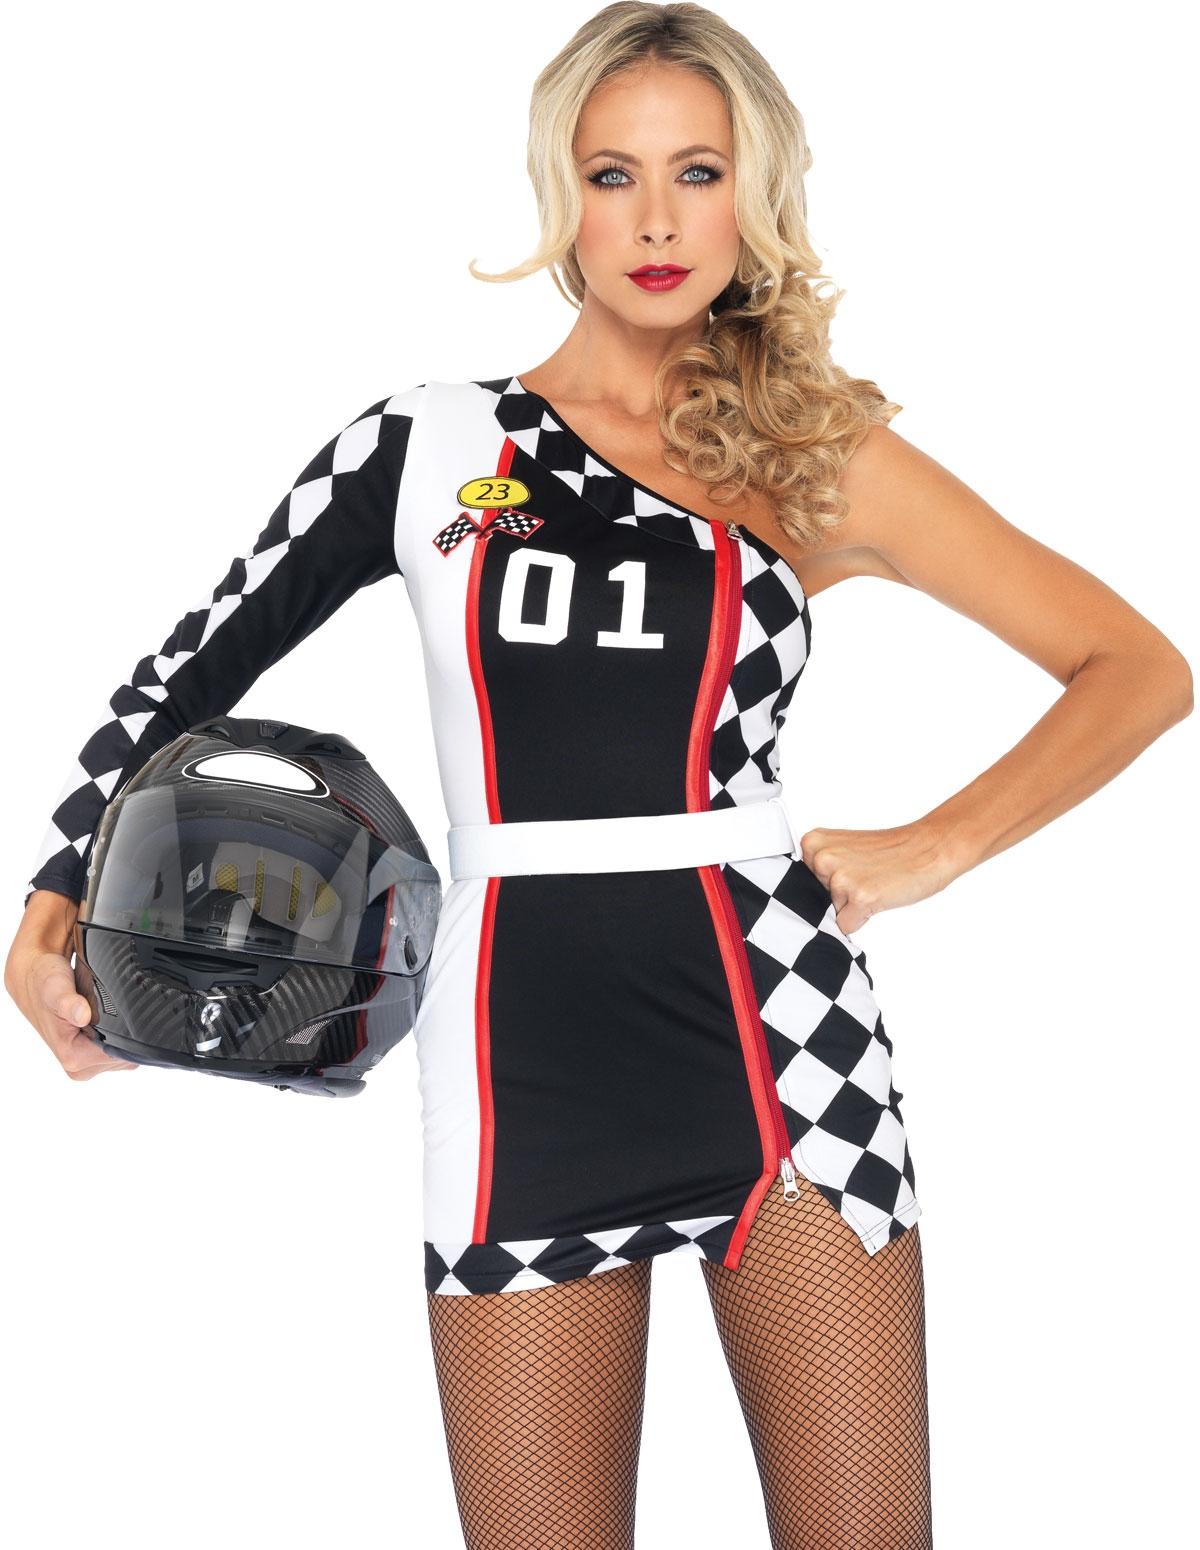 1St Place Racer Romper Costume